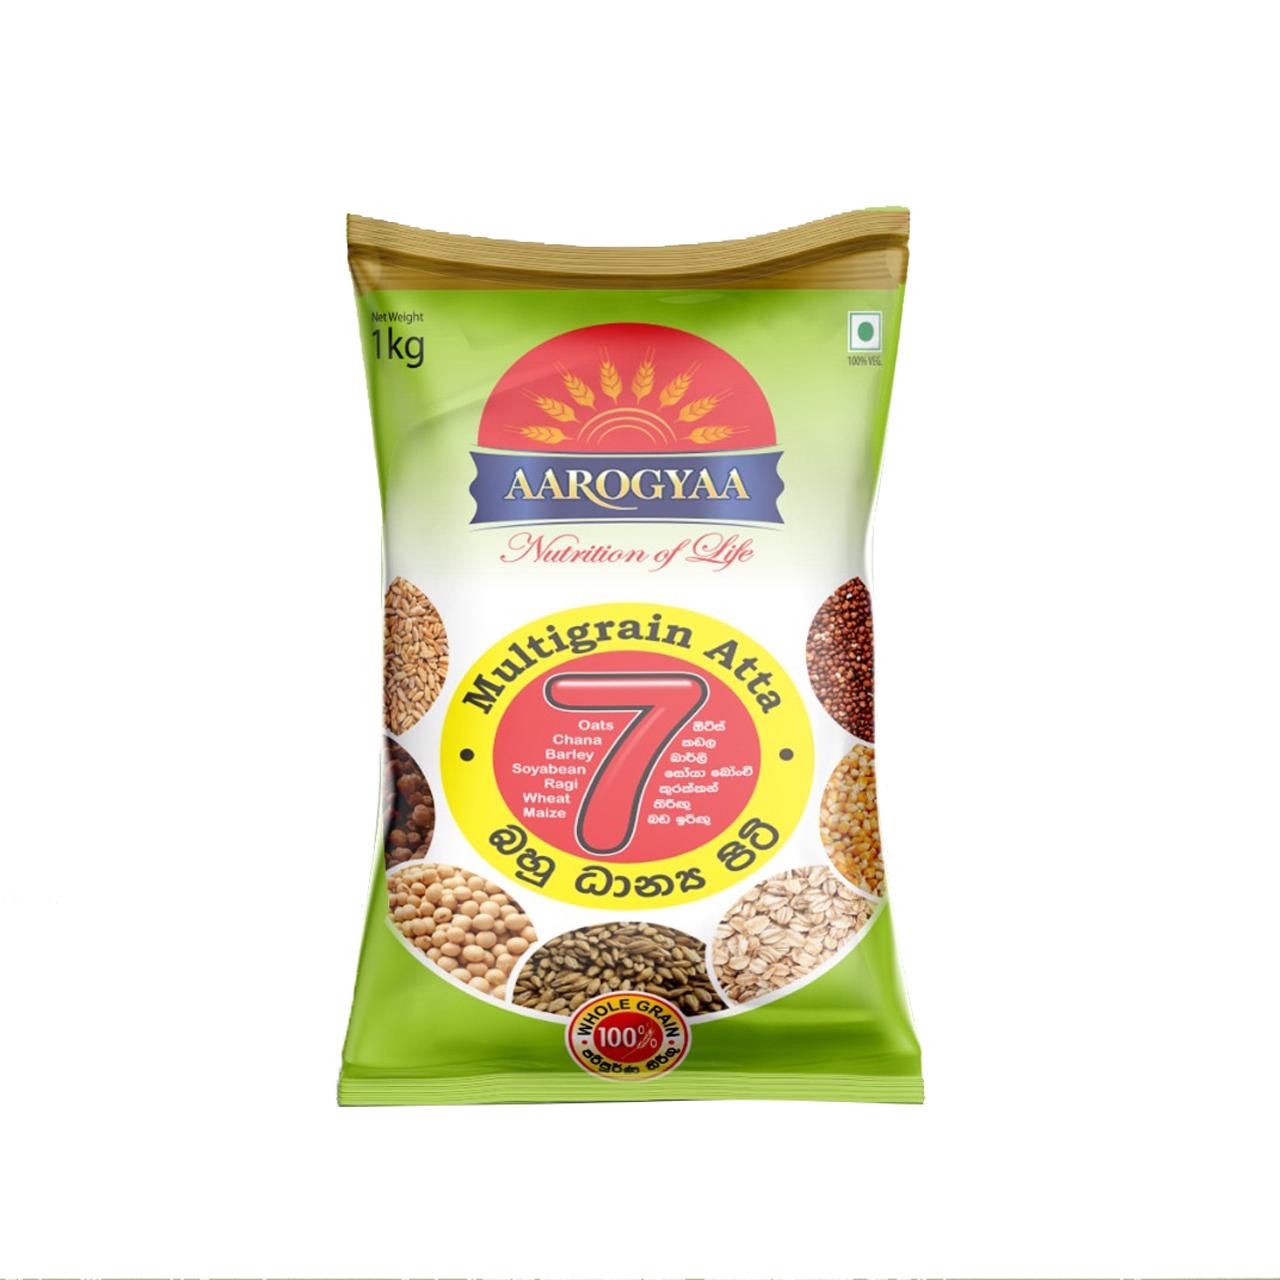 Aarogyaa Multigrain Atta Flour 1kg - in Sri Lanka